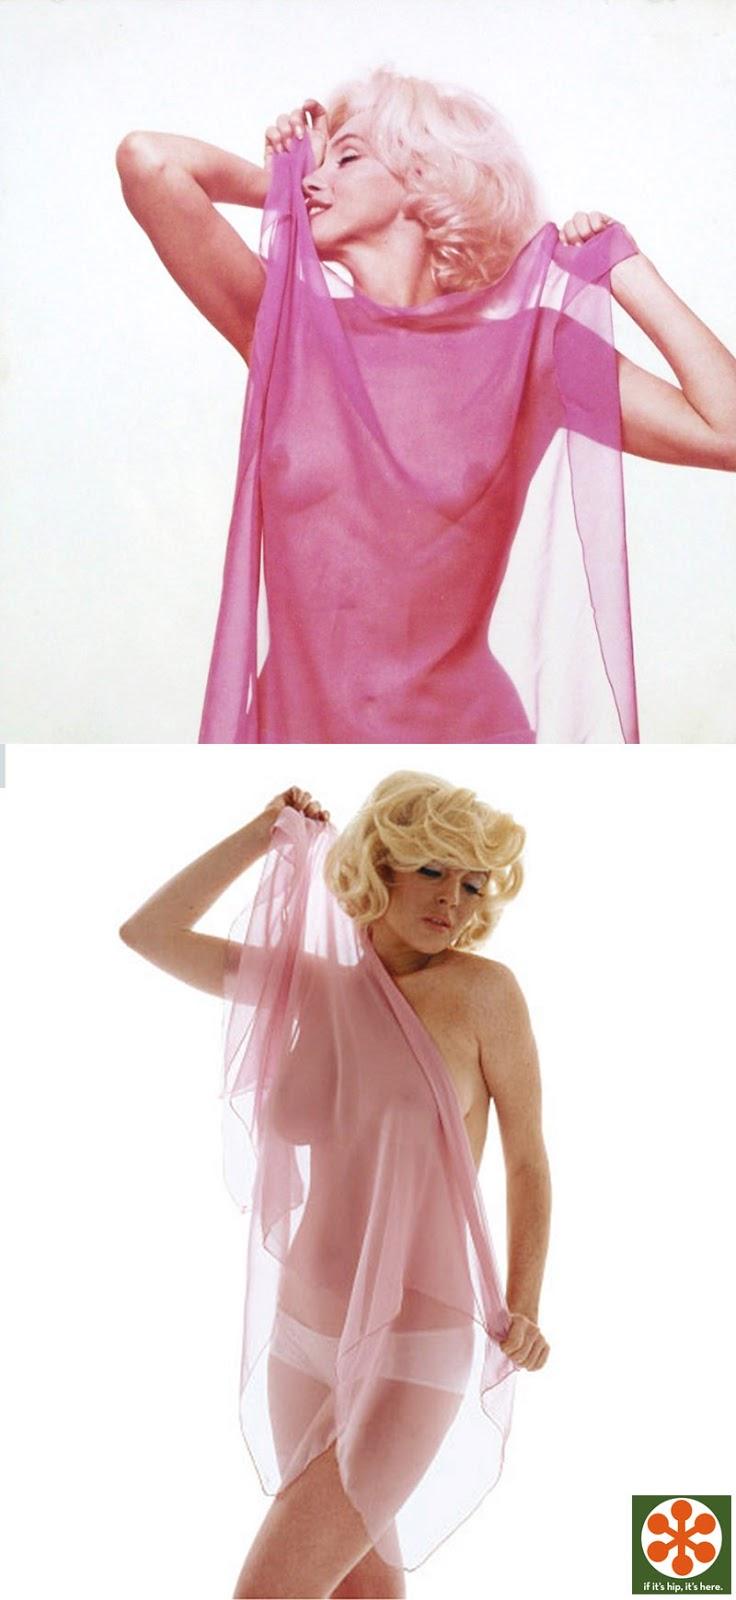 Anne Lockhart (actress),Dru Berrymore XXX nude Melissa Sue Anderson,Carrie Prejean